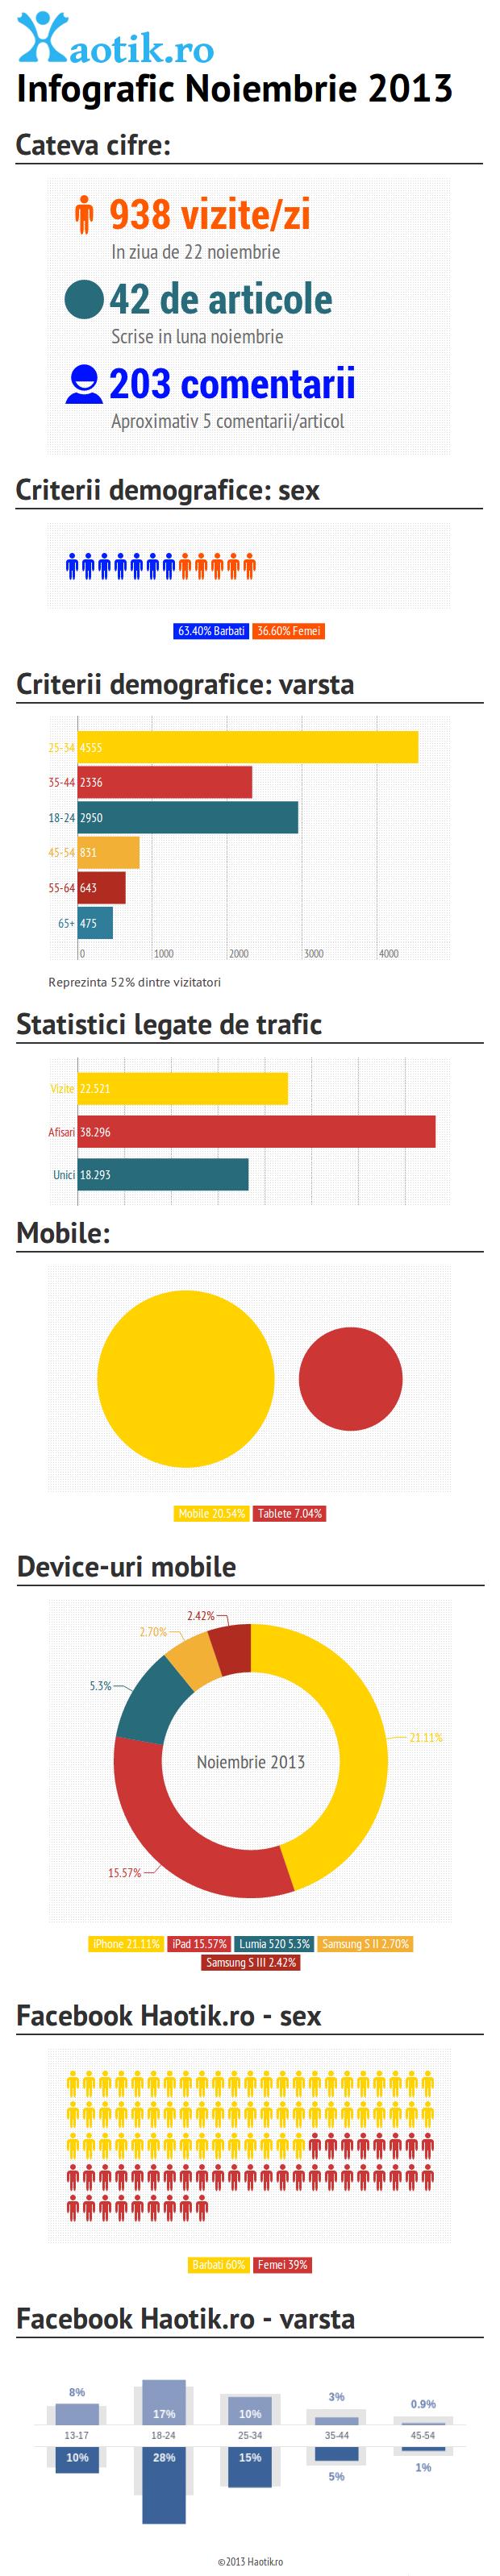 Infografic Haotik.ro Noiembrie 2013